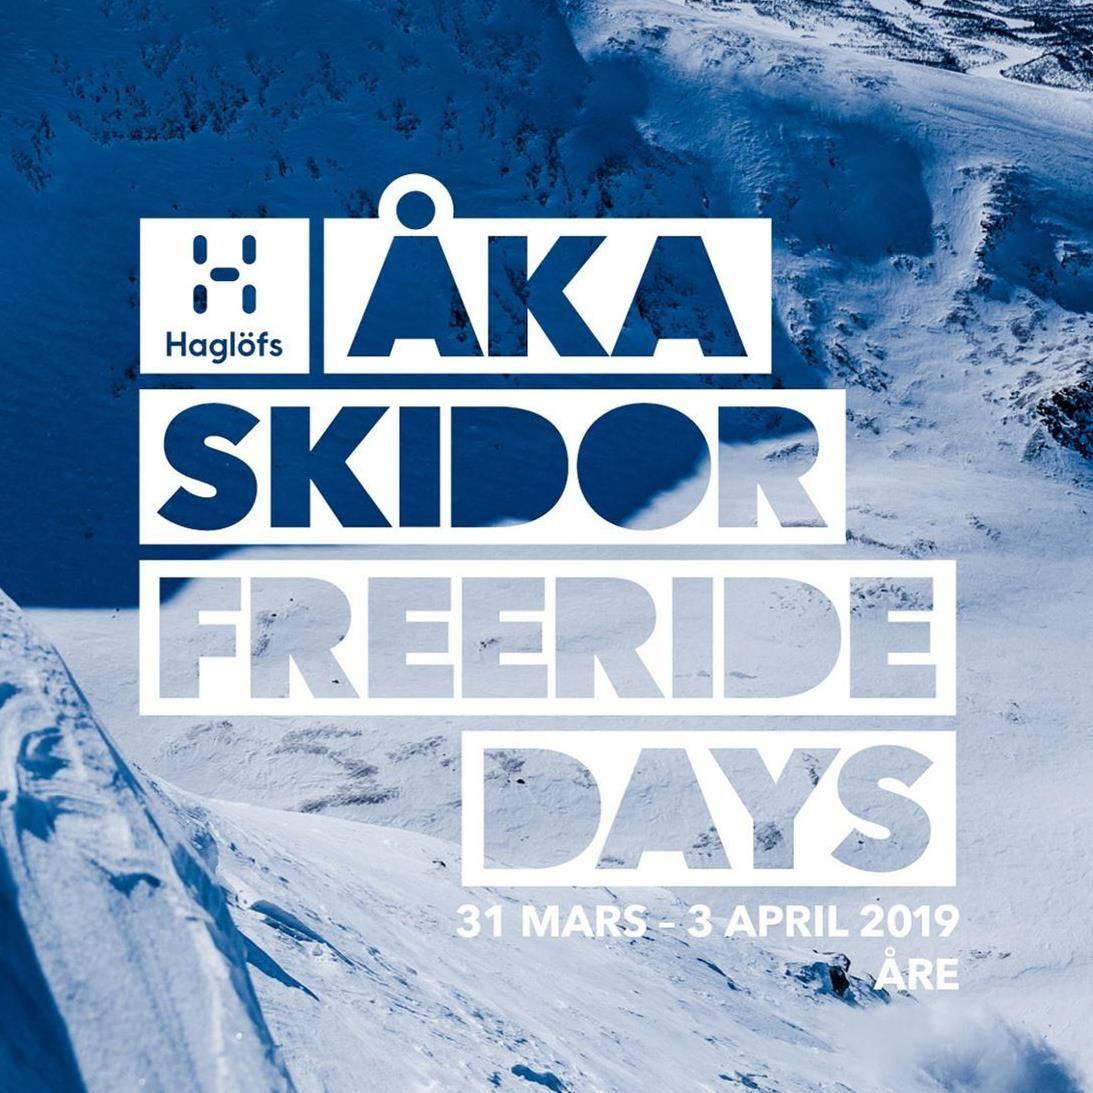 Haglöfs Åka Skidor Freeride Days